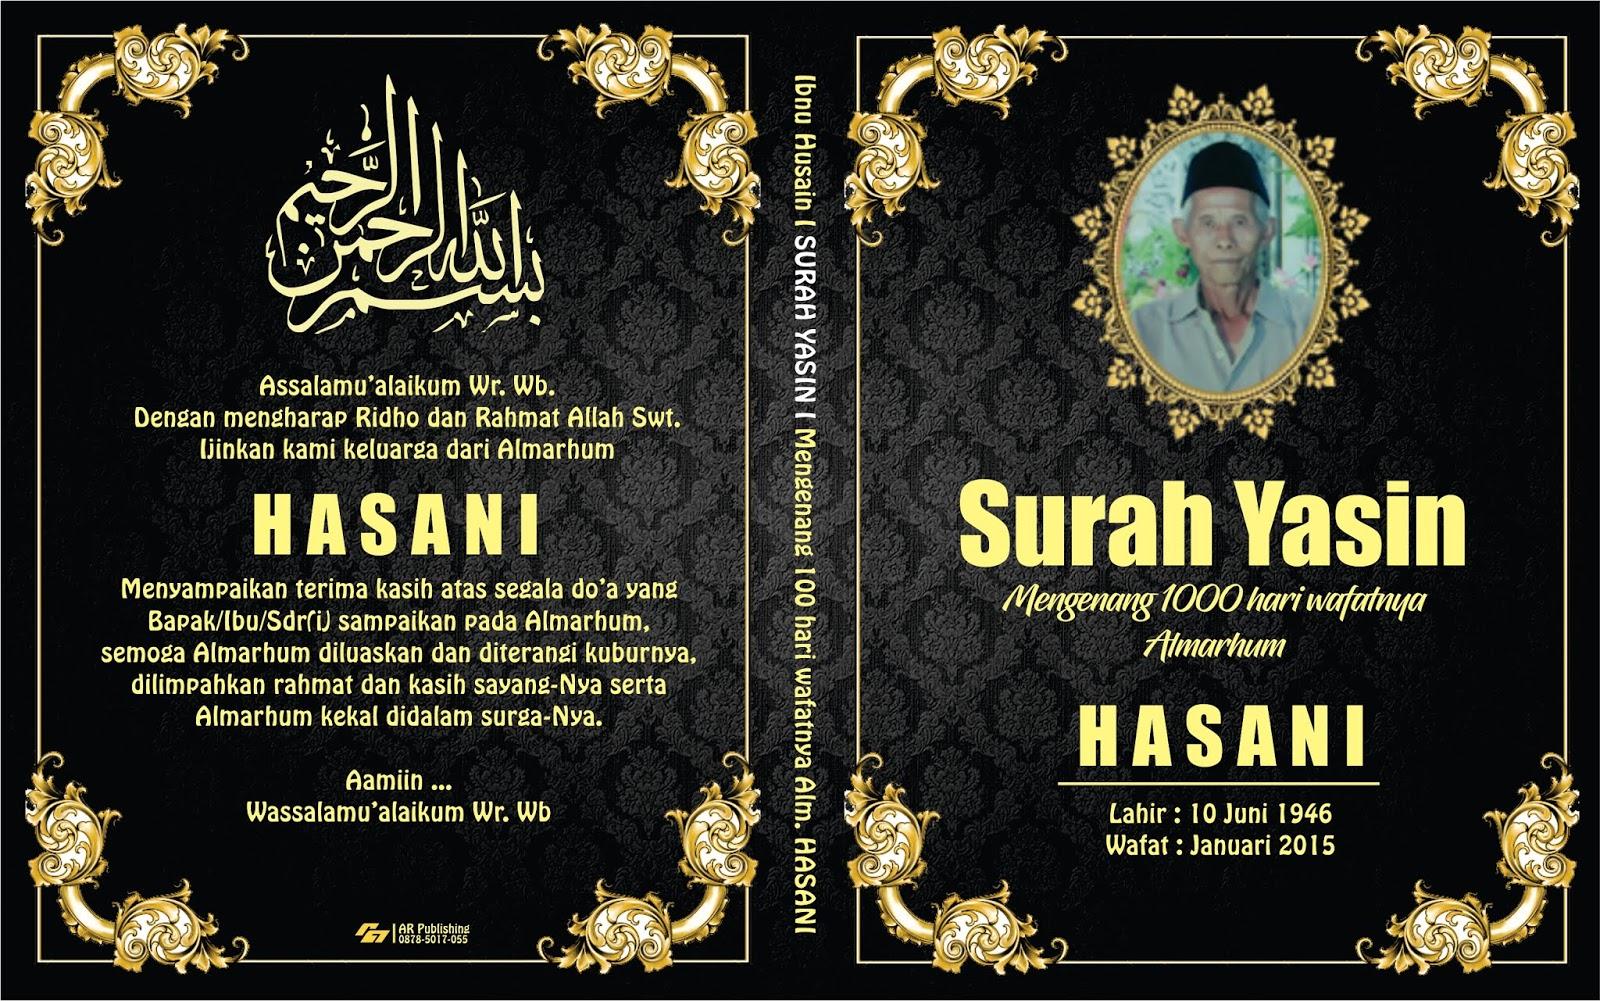 surah yasin vector file free